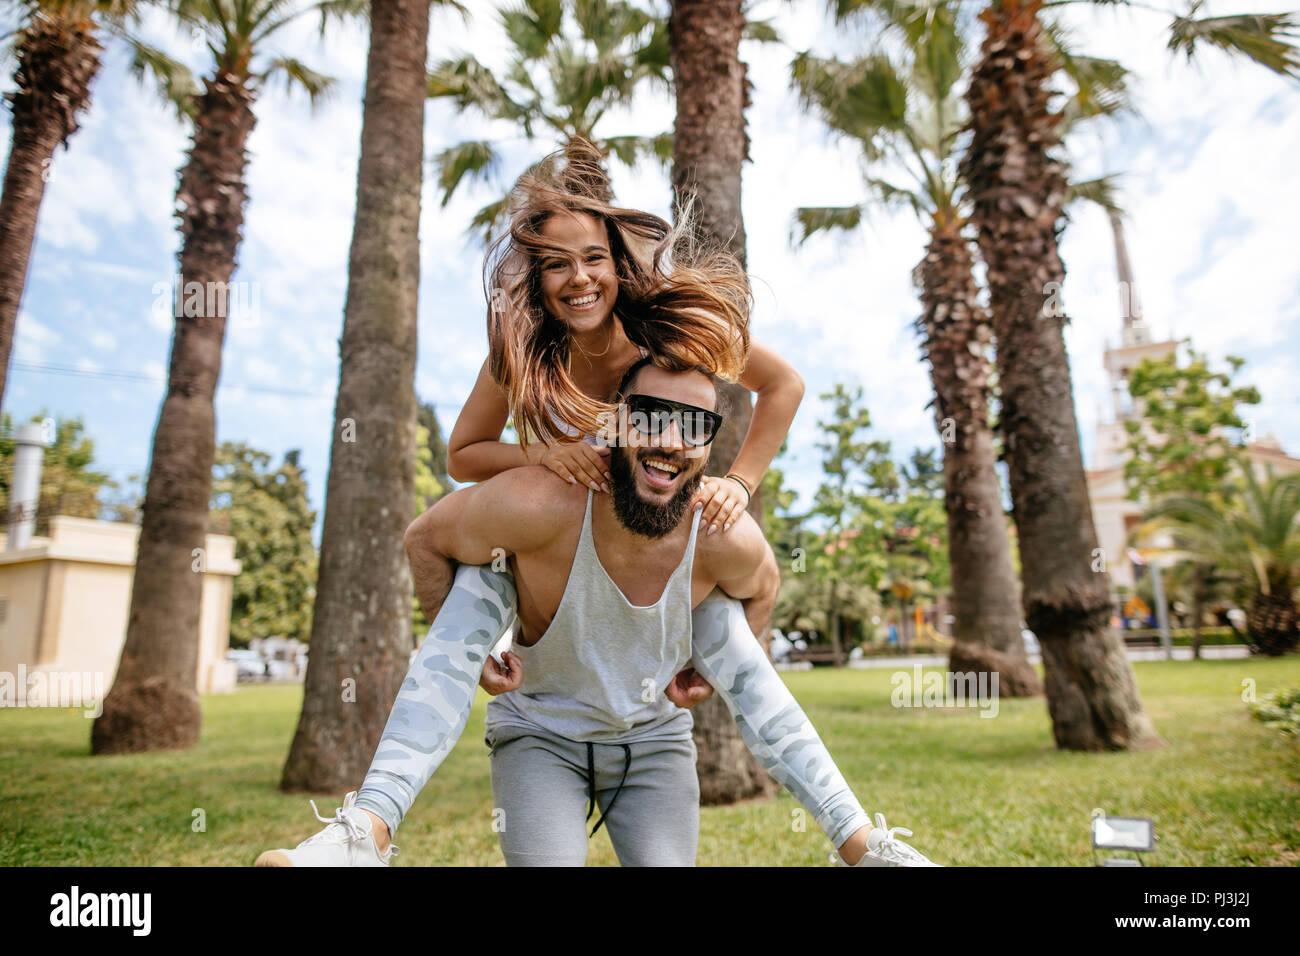 Playful sportive men giving piggyback ride to women at tropical park - Stock Image